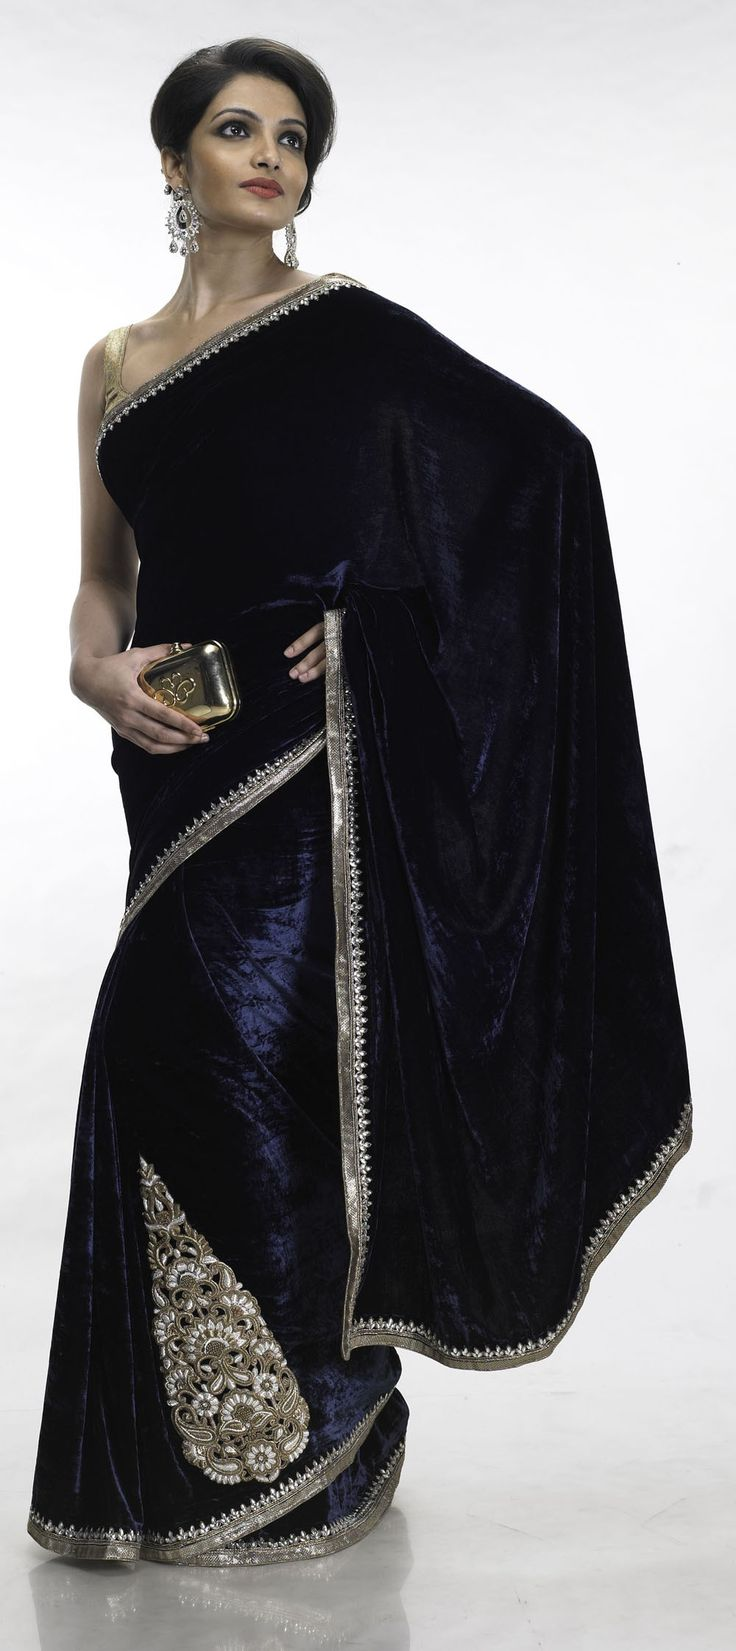 Royal velvet sari, stunning for an engagement party